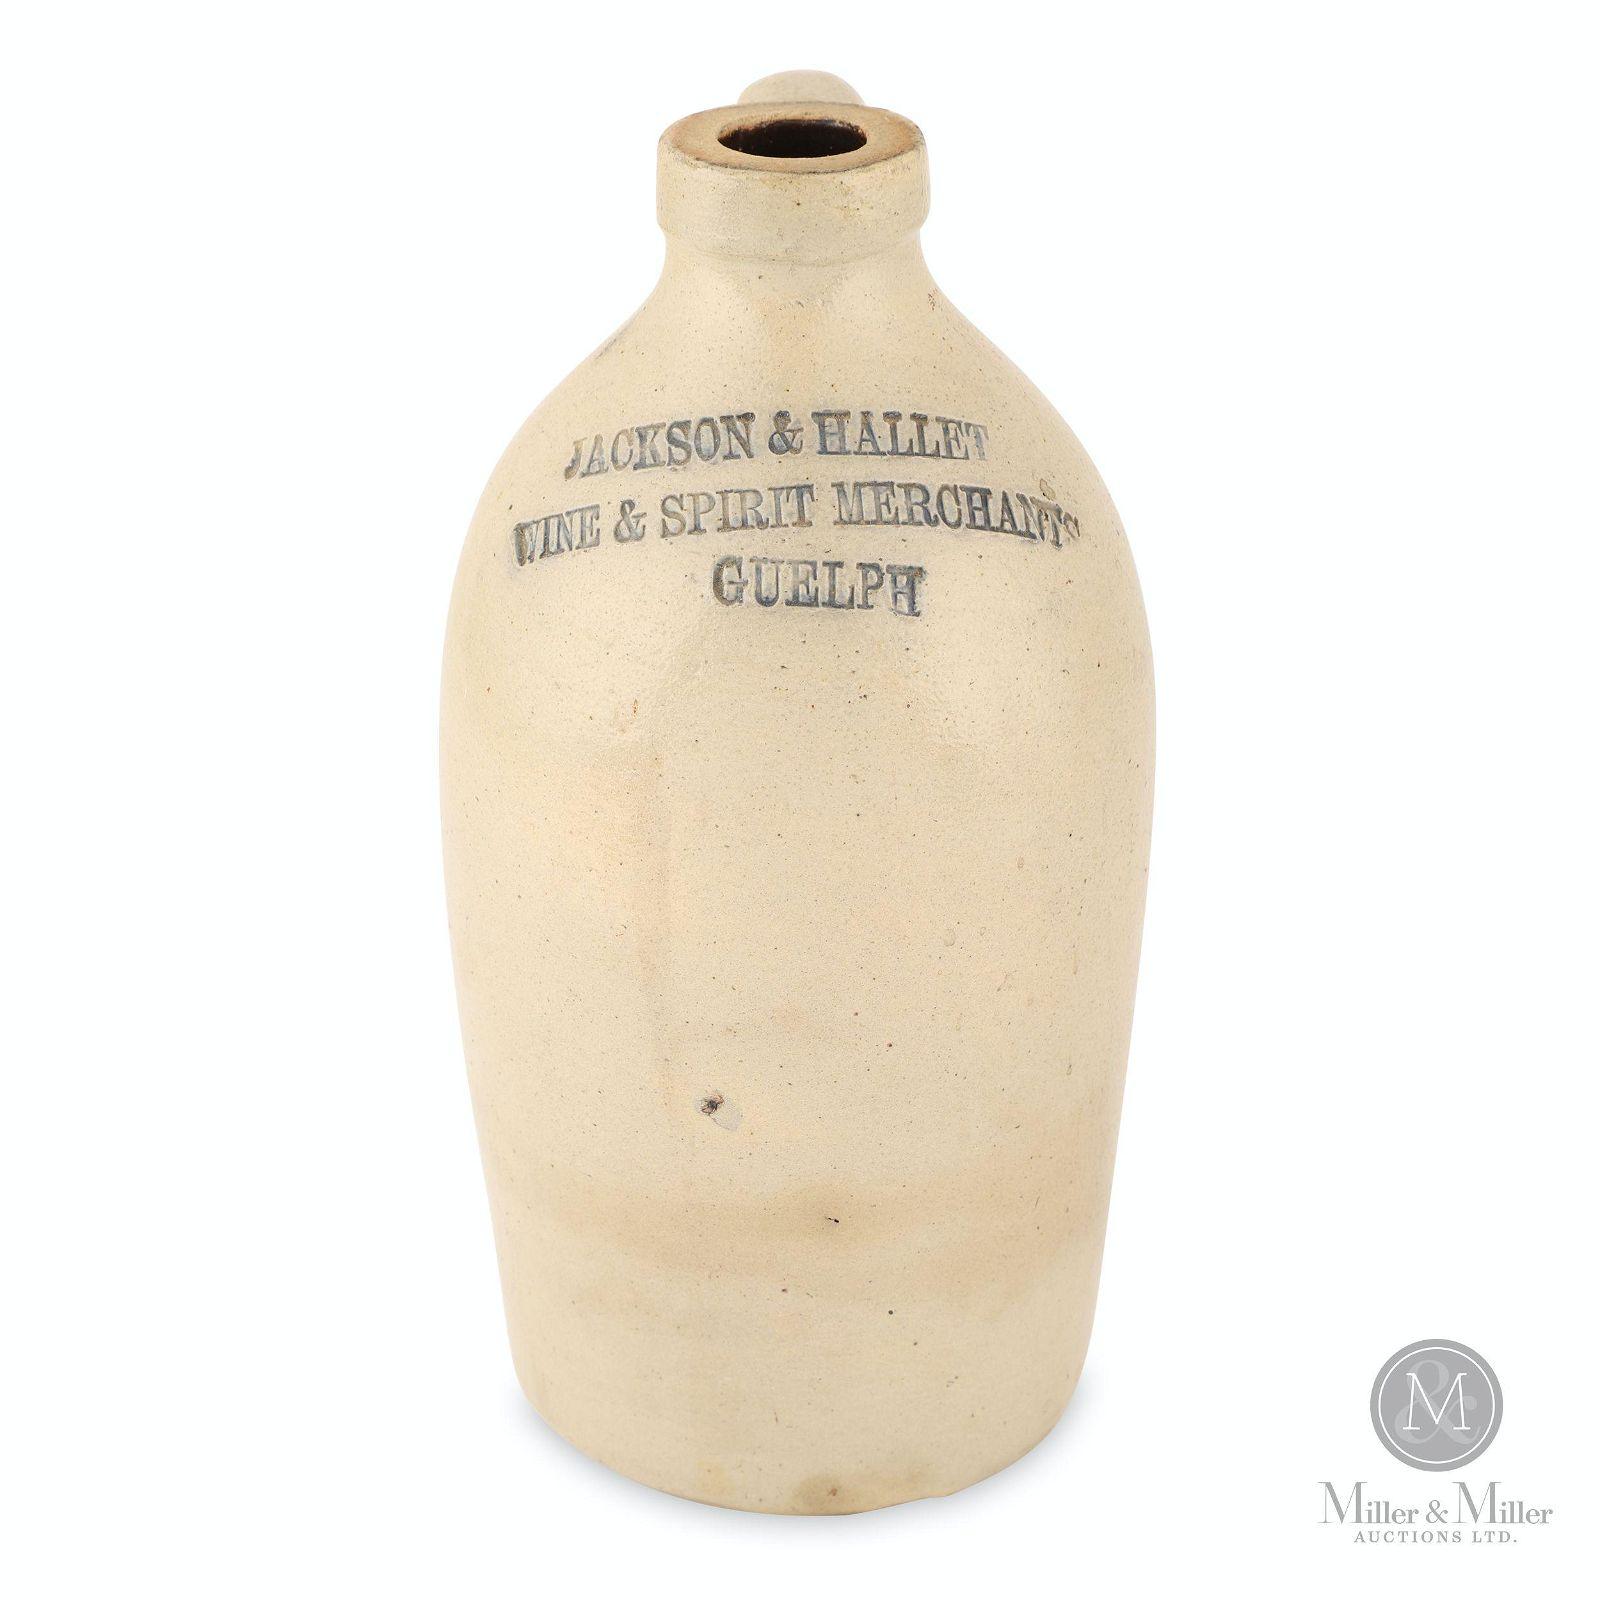 Jackson & Hallett, Guelph 1/4 Gallon Jug